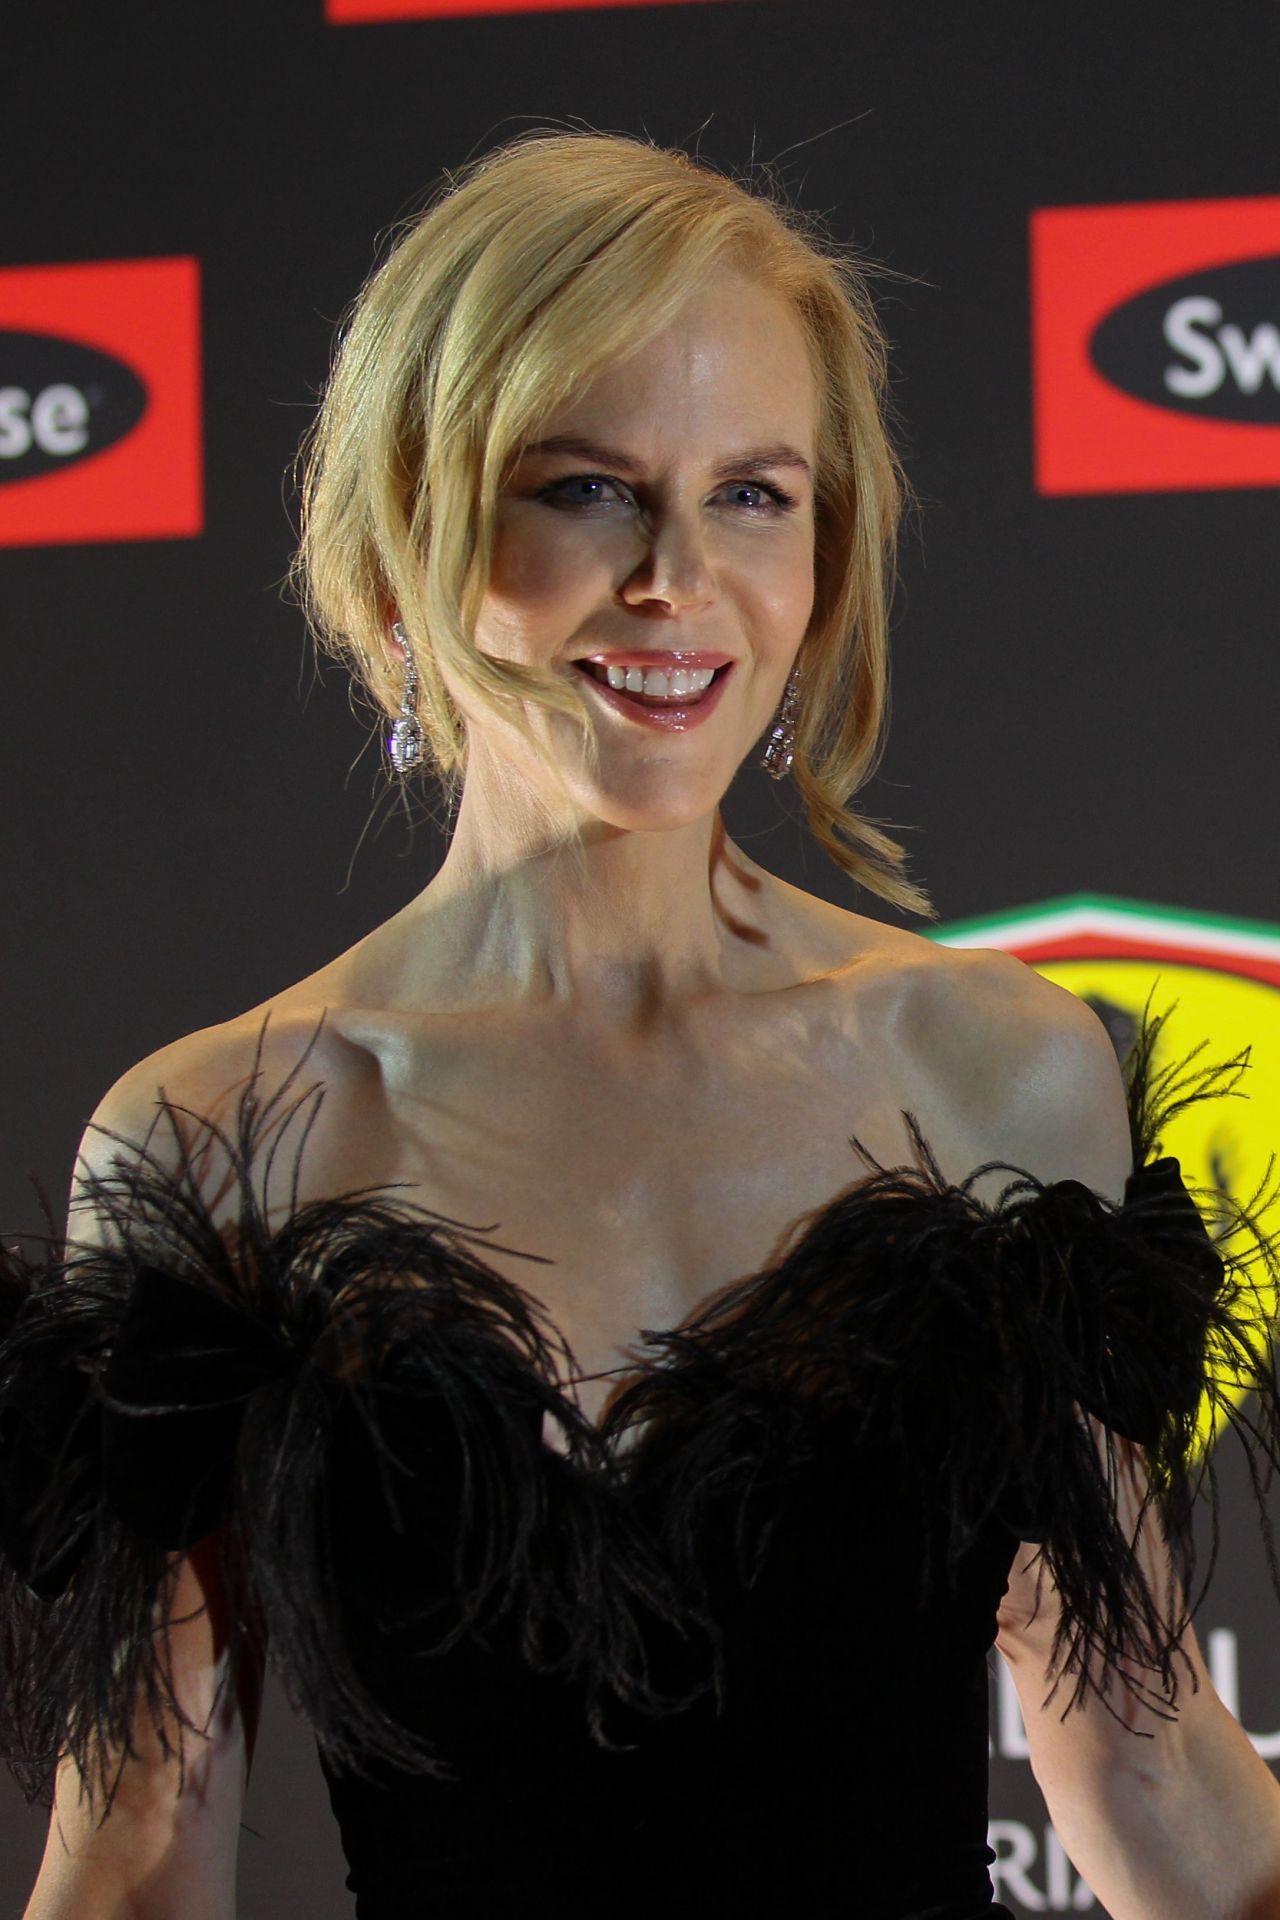 Nicole Kidman Swisse And Ferrari Event In Melbourne 3 25